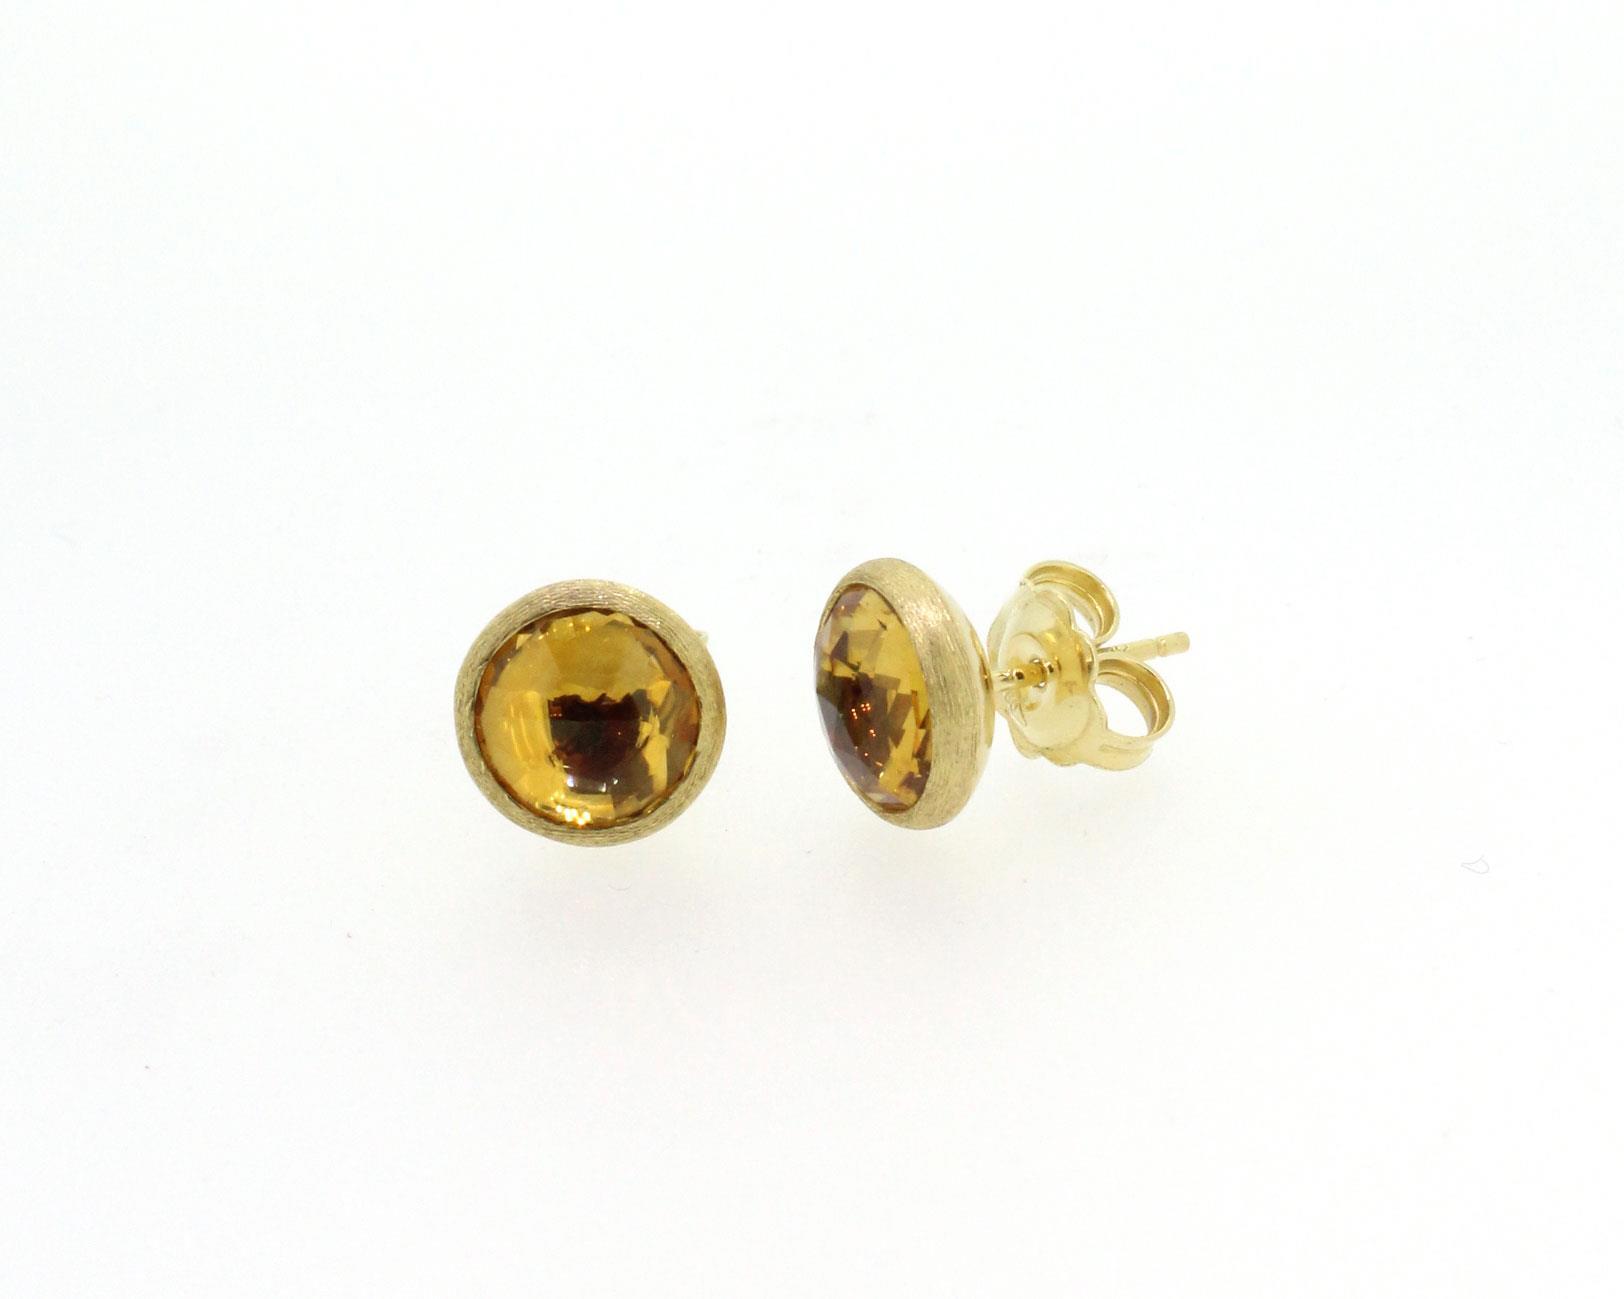 Ohrstecker Jaipur 18ct Gold - Marco Bicego - OB957QG01